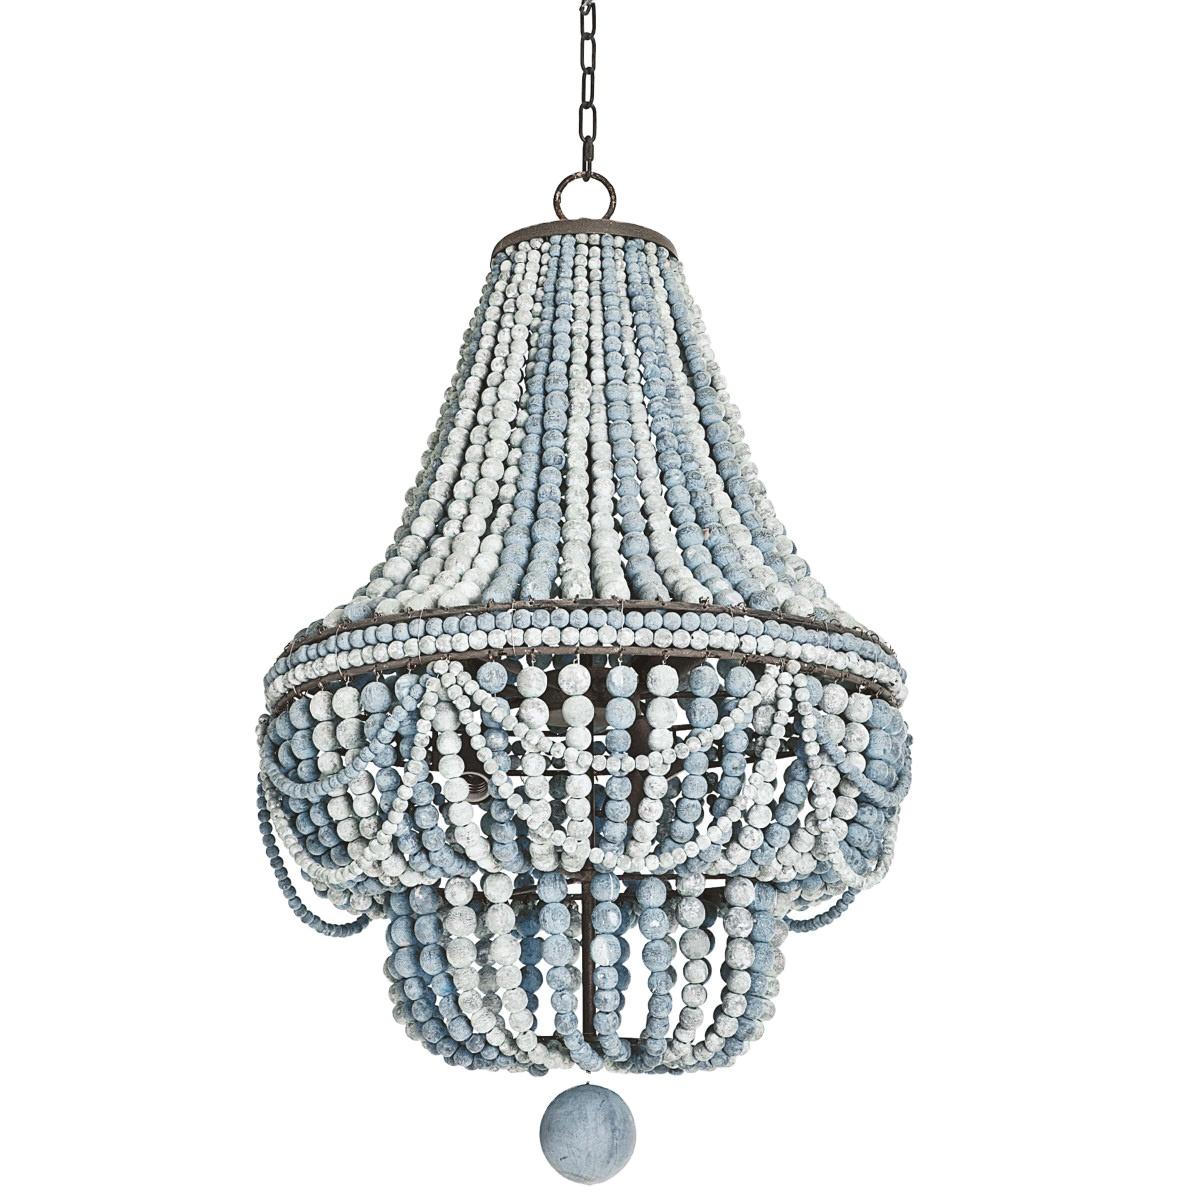 American retro old wood chandelier industrial loft style bar cafe decorative creative vintage wood beads chandelier